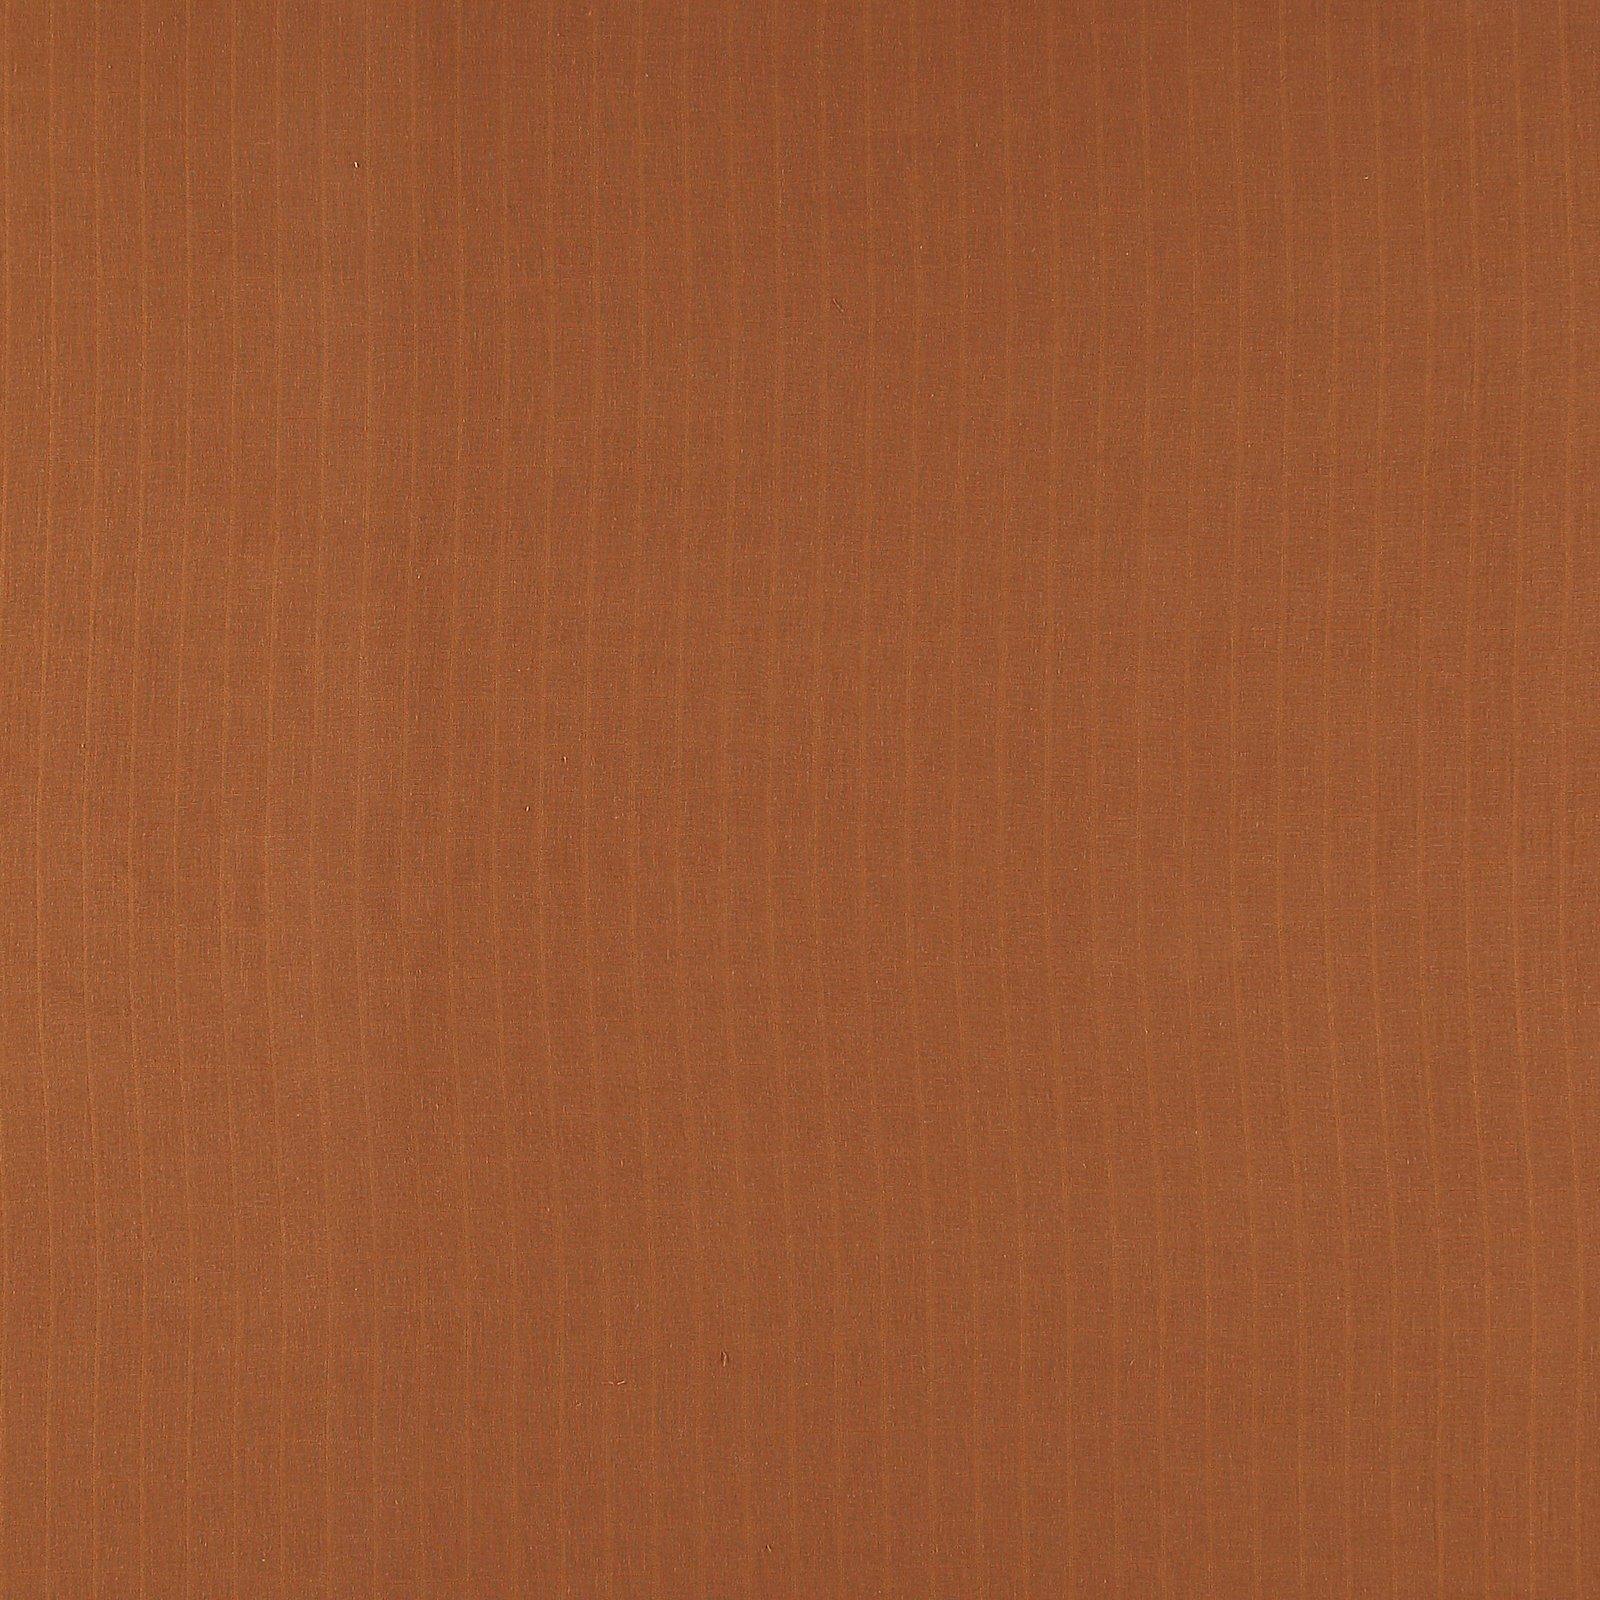 Muslin light brown 500014_pack_solid